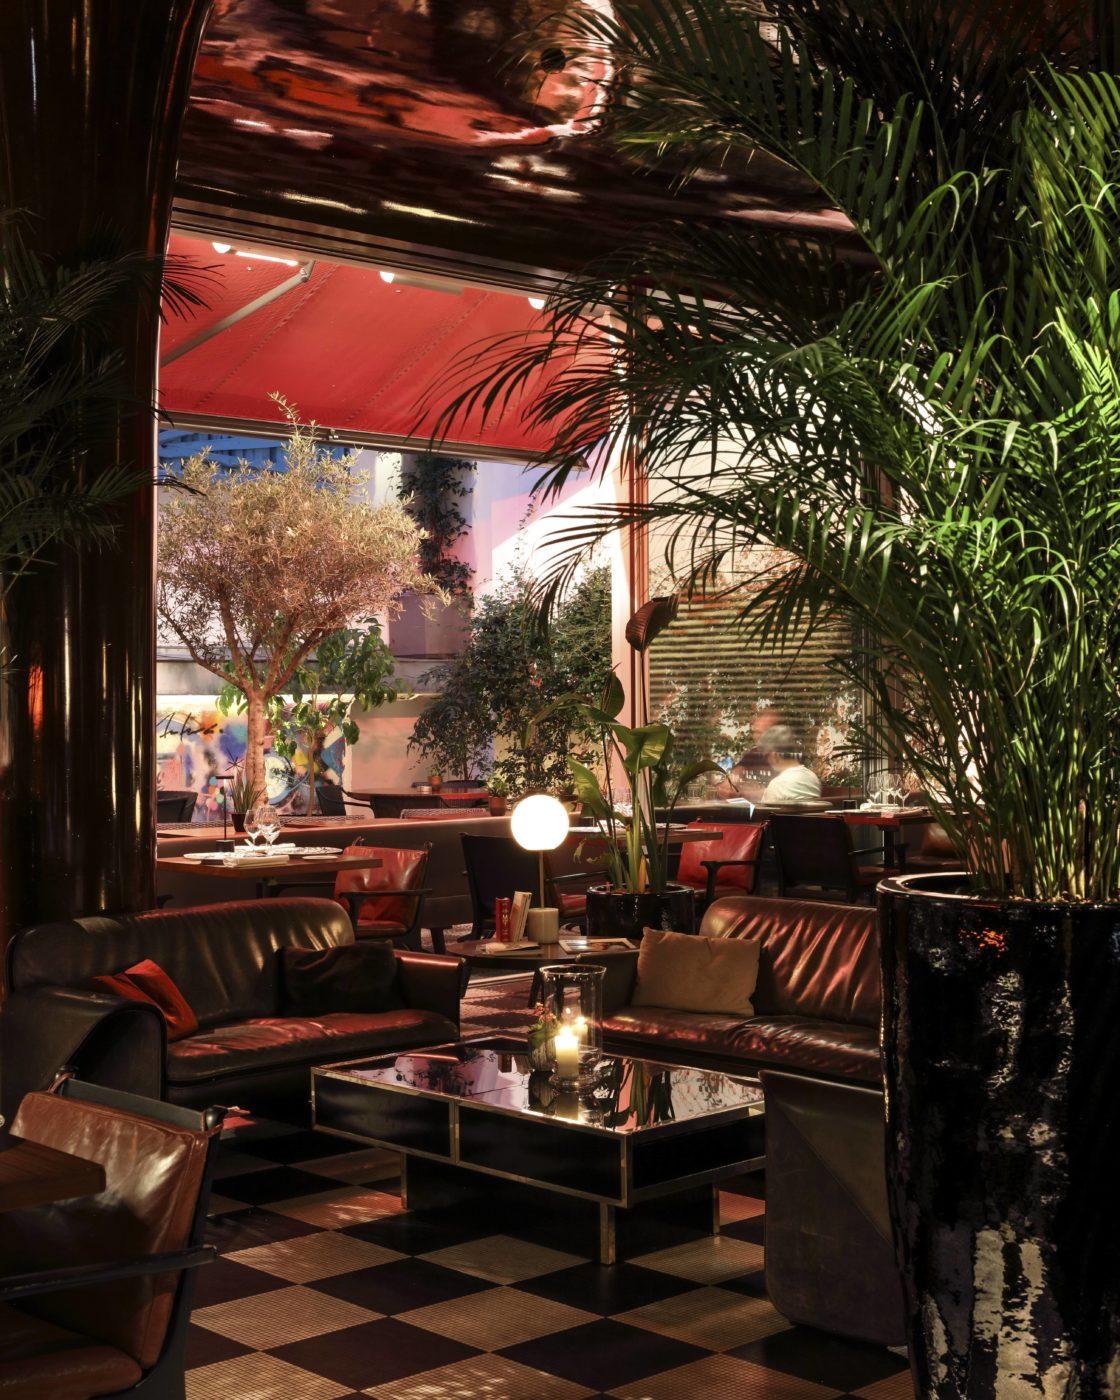 roxo restaurant les bains paris